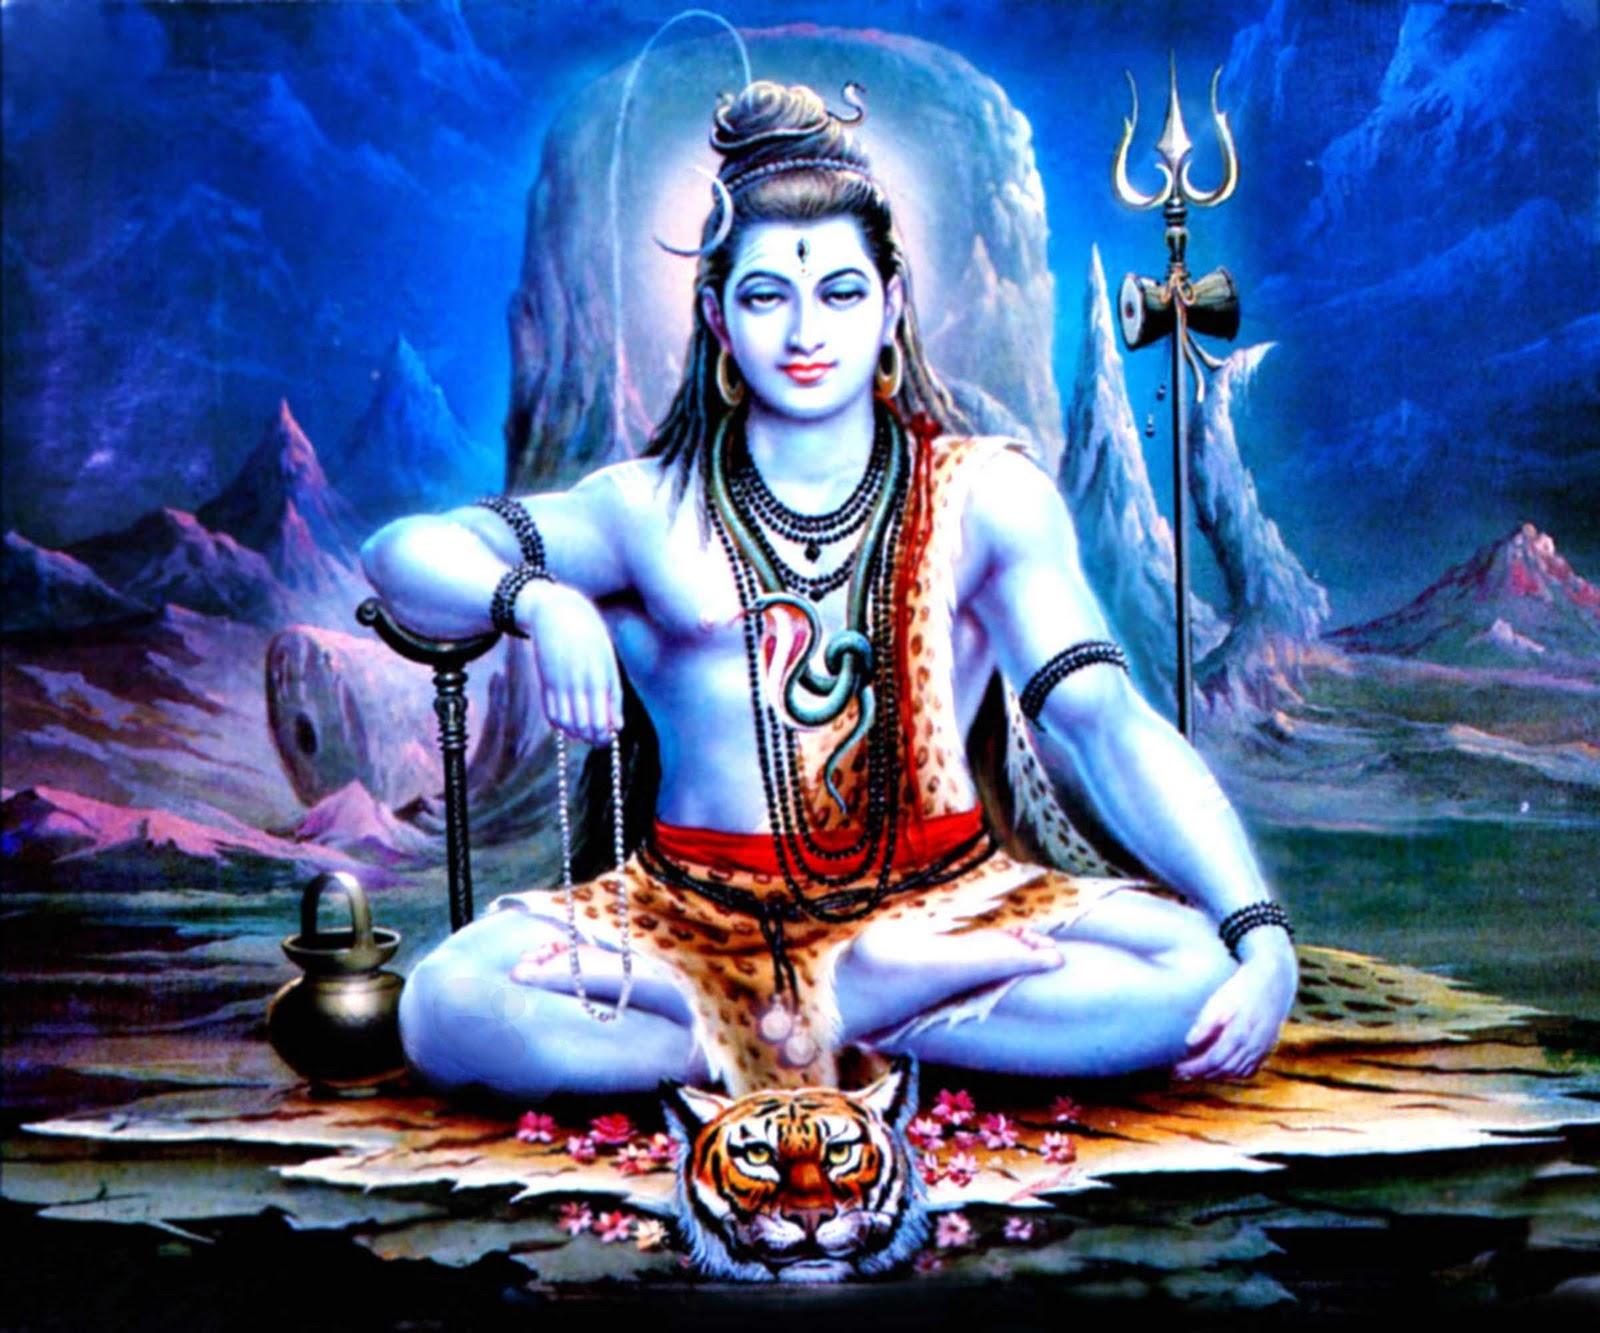 http://2.bp.blogspot.com/-g4SFwGczH2w/T19kx7jV9CI/AAAAAAAAUR0/1D2zLuLCsxU/s1600/Lord-Shiva-Wallpapers-2011-2.jpg